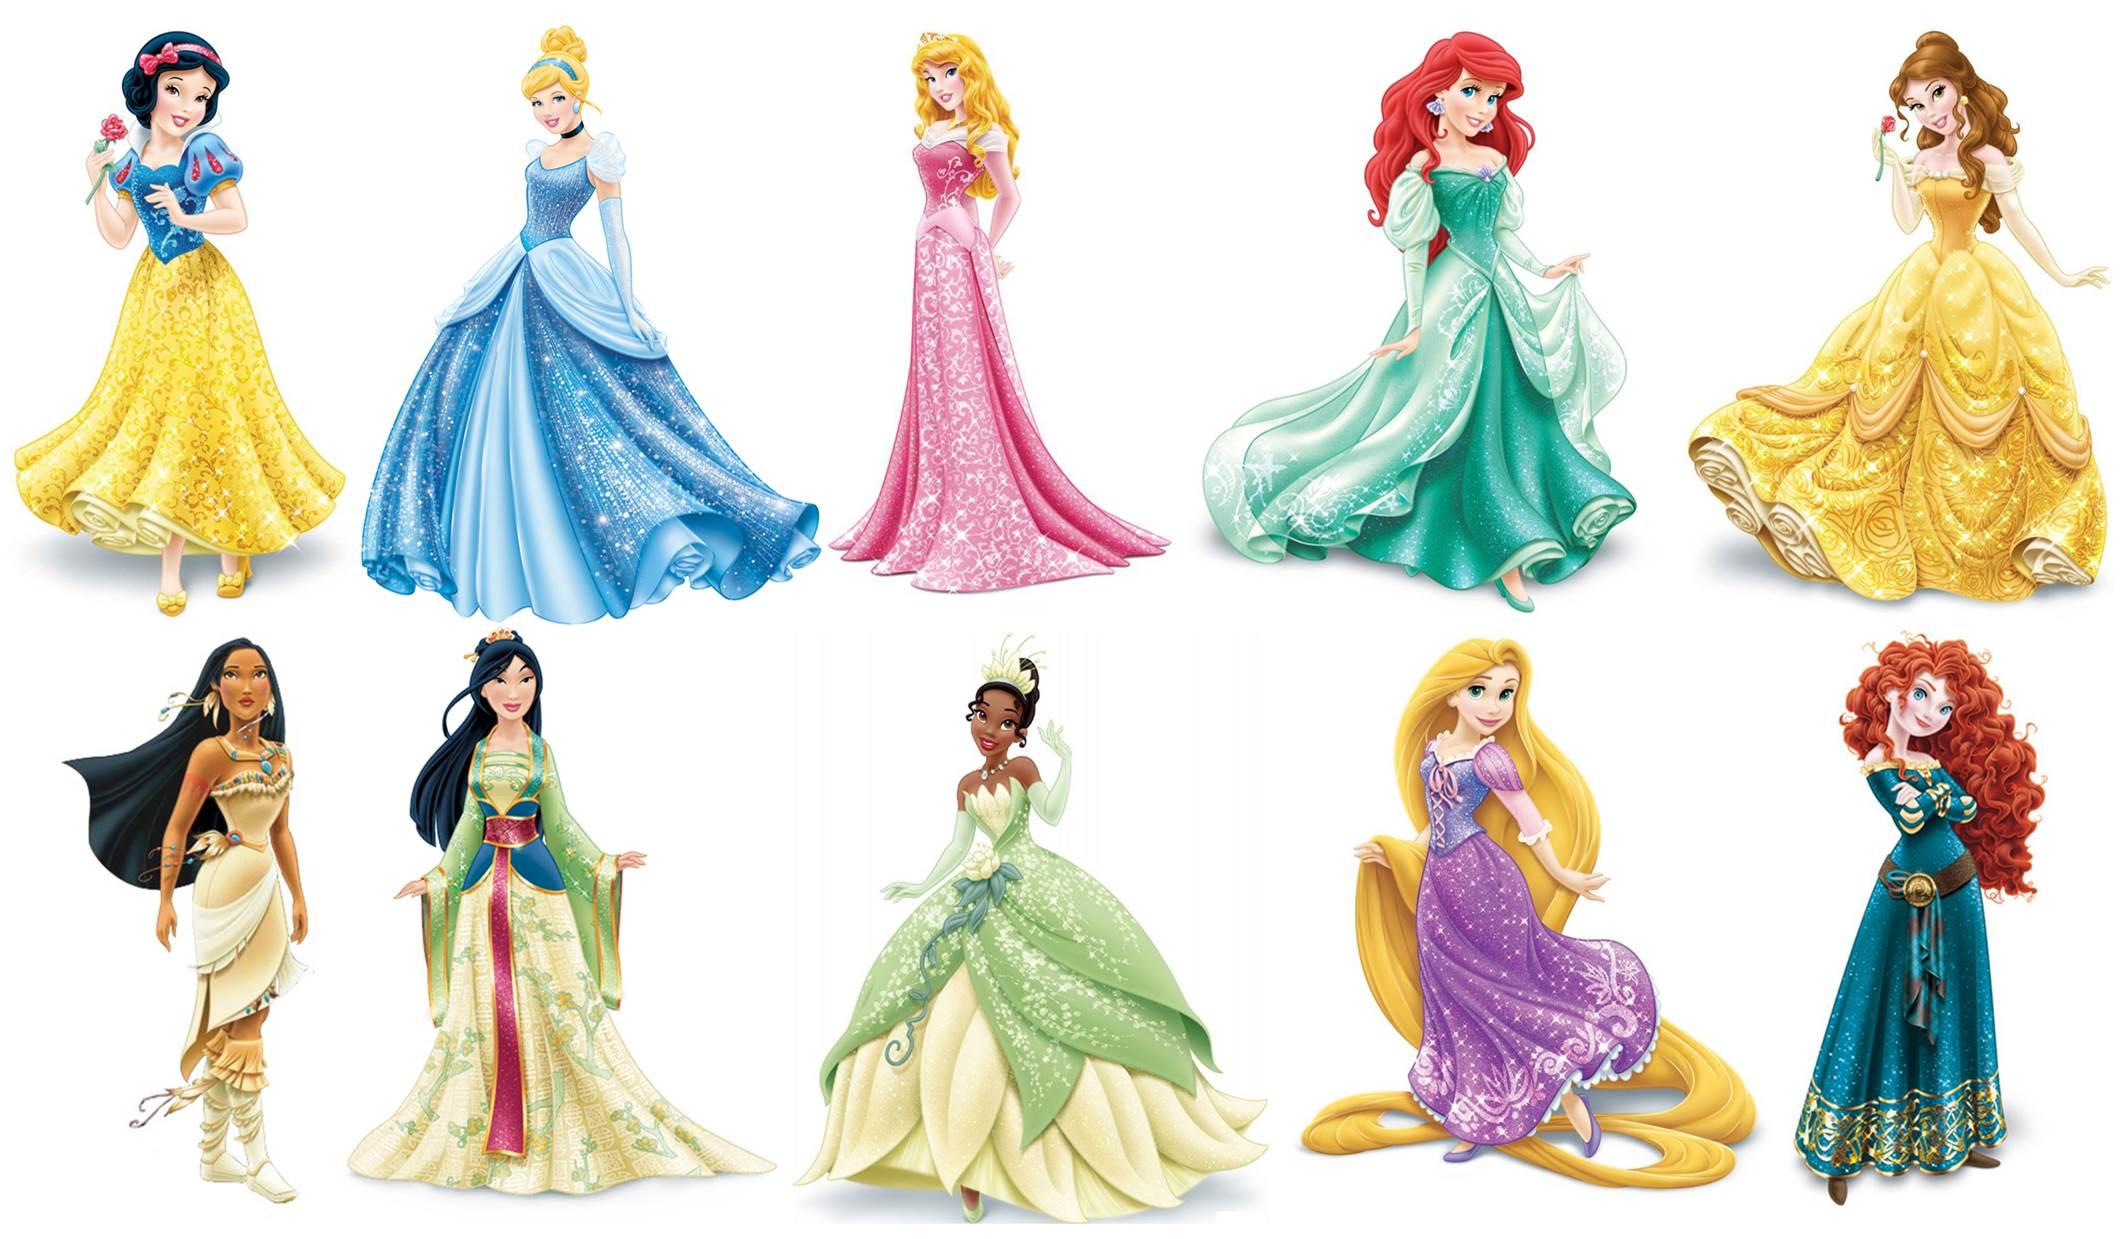 Disney Princesses. Disney Princesses. Disney Princesses Clipart .